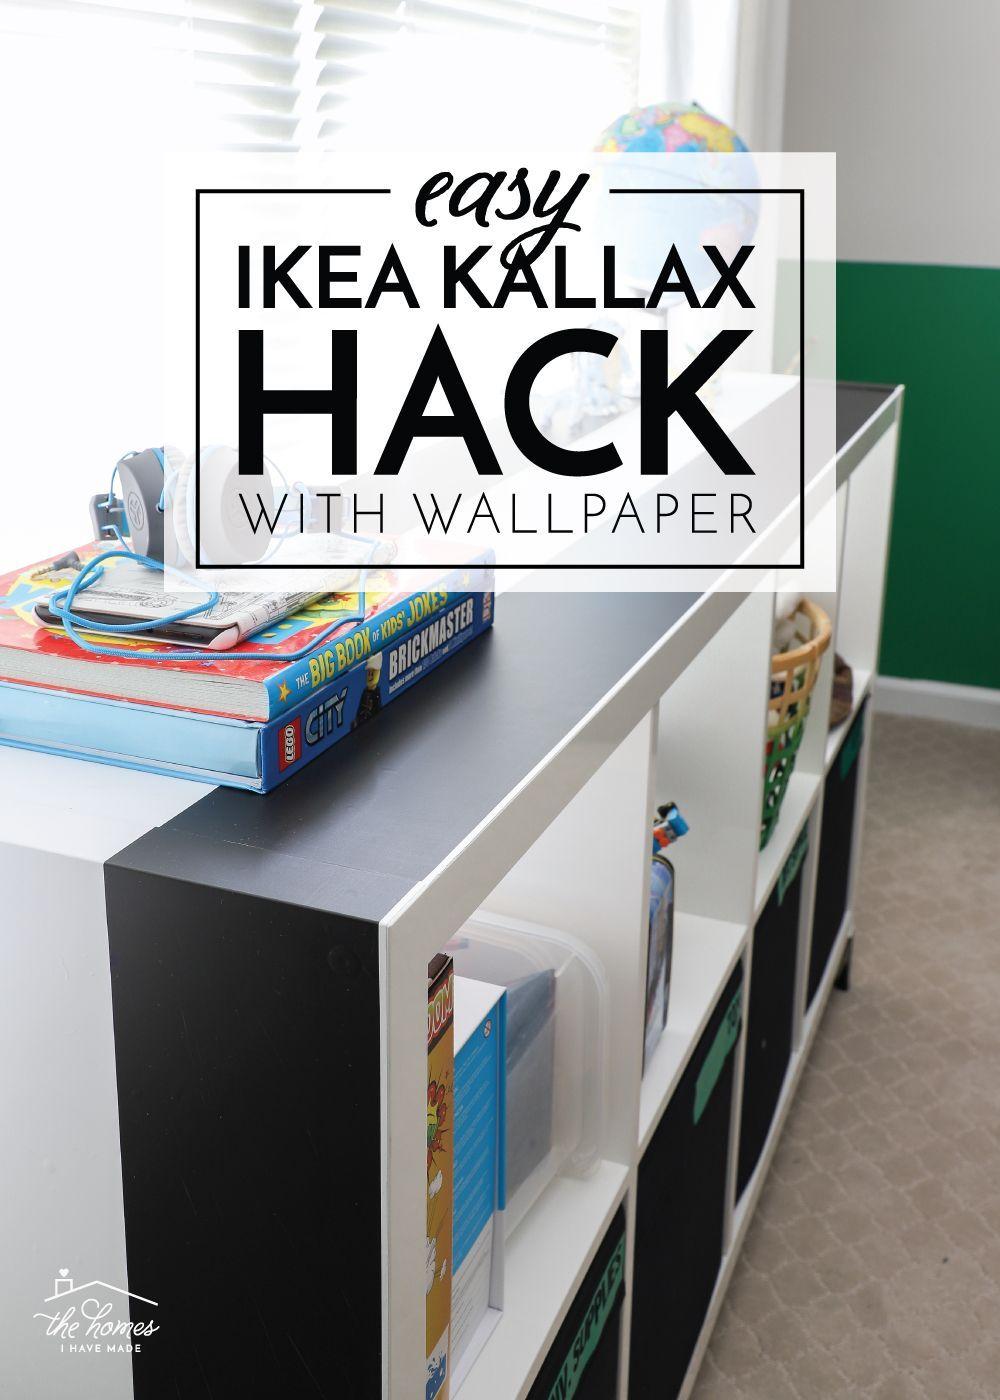 Ikea Kallax Hack With Wallpaper Kallax Ikea Ikea Kallax Hack Ikea Wallpaper